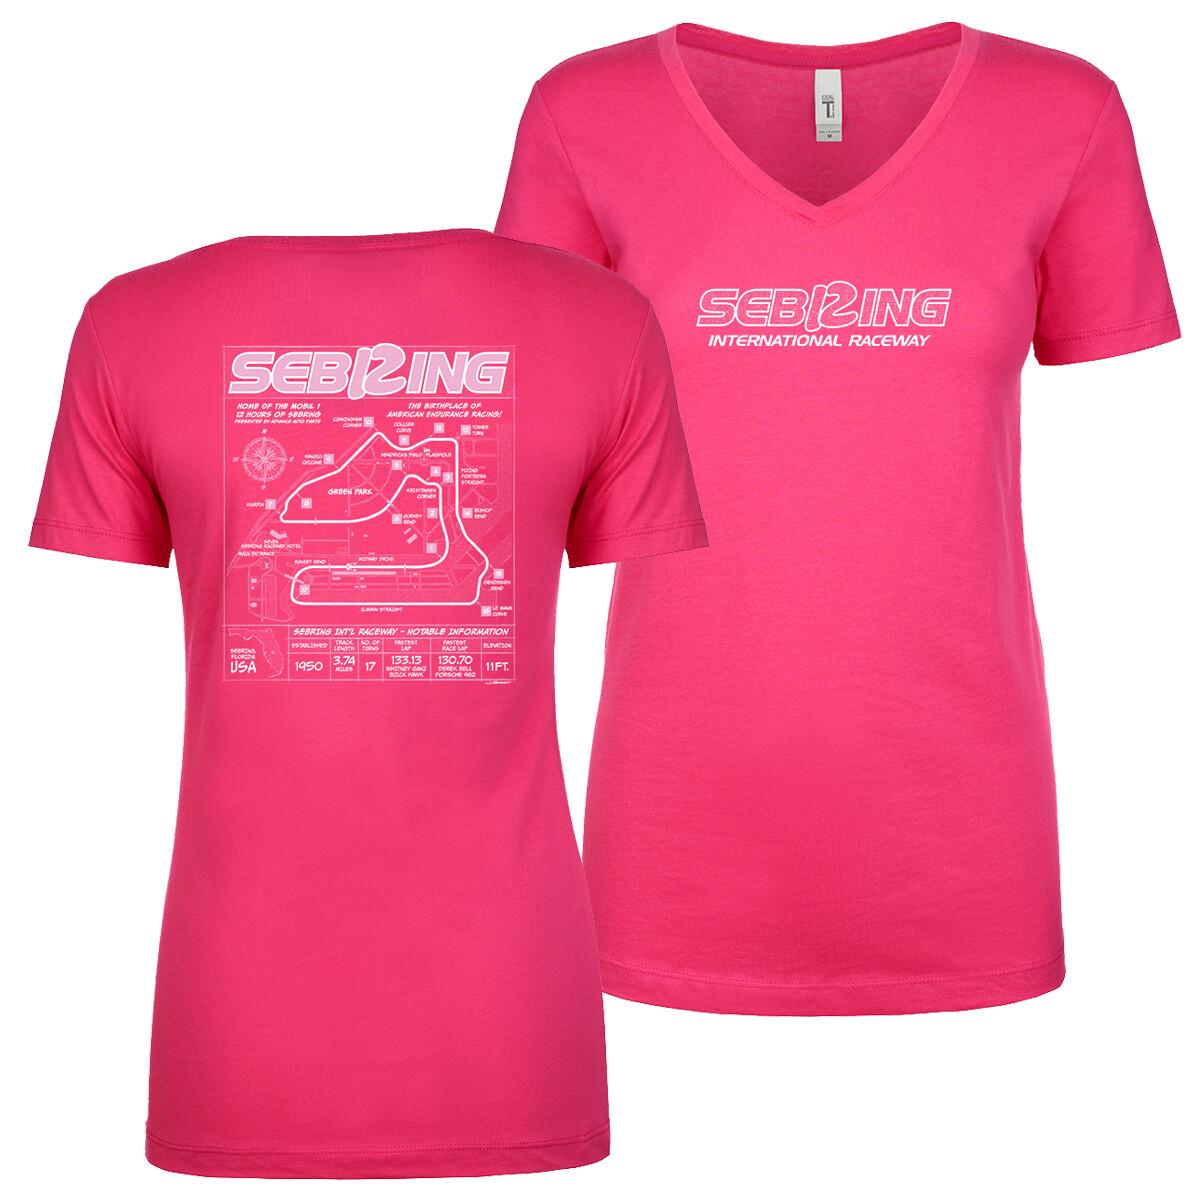 Sebring Ladies Blueprint V-neck Top - Dark Fucshia